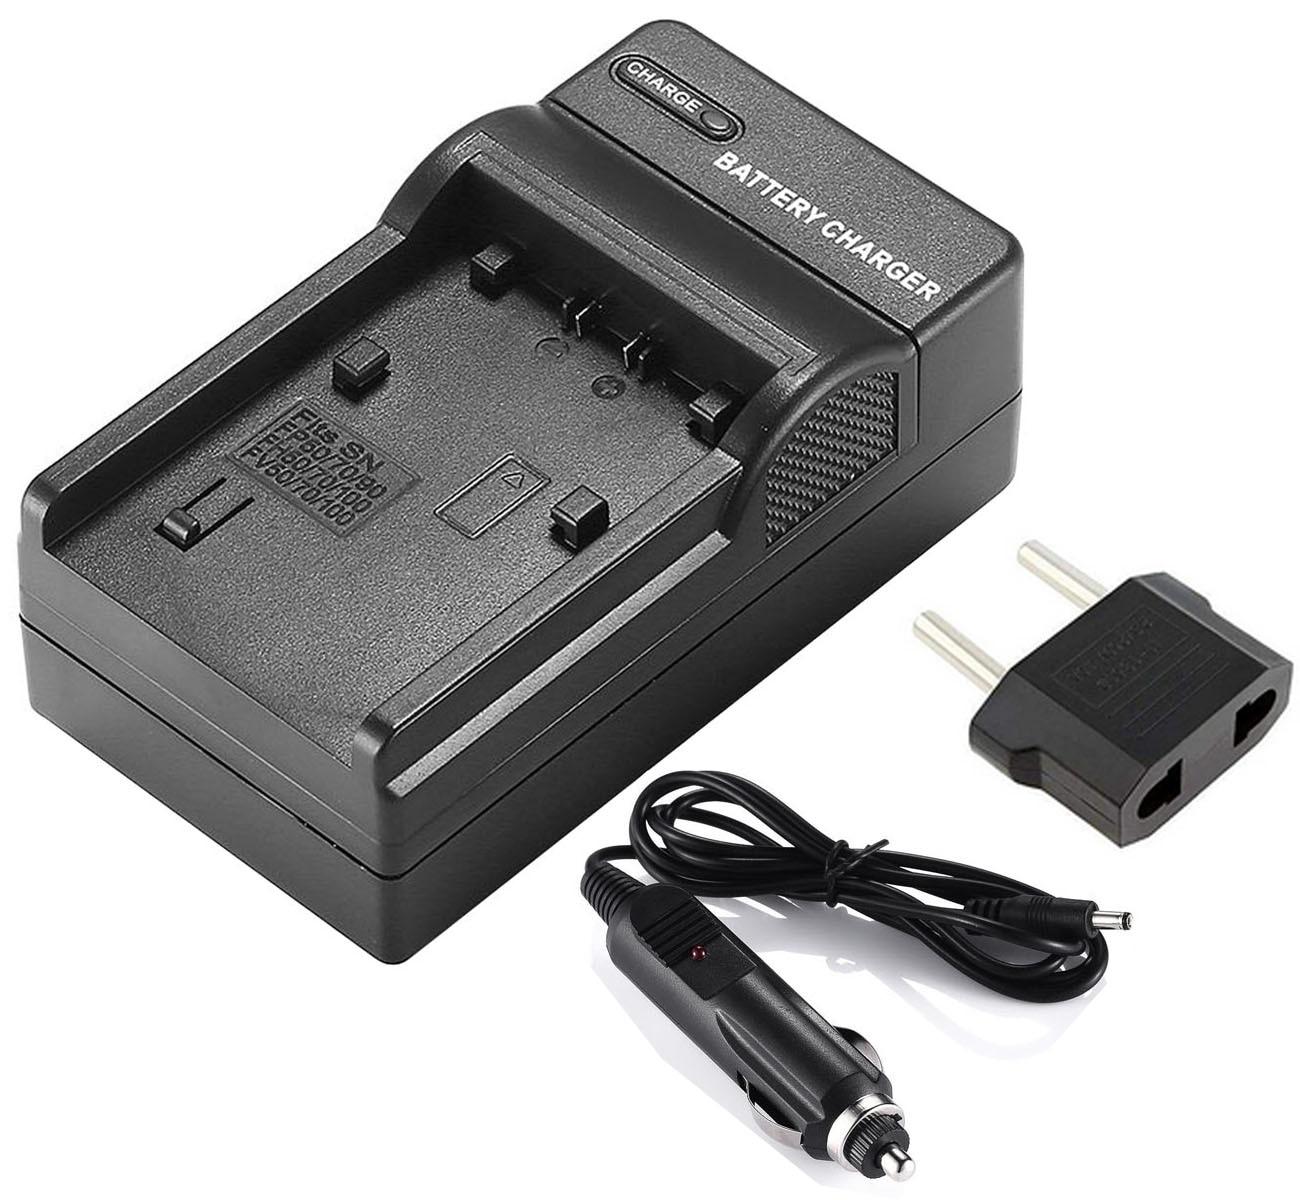 CAMCORDER AKKU-LADEGERÄT LADESTATION FÜR SONY Handycam HDR-CX115E